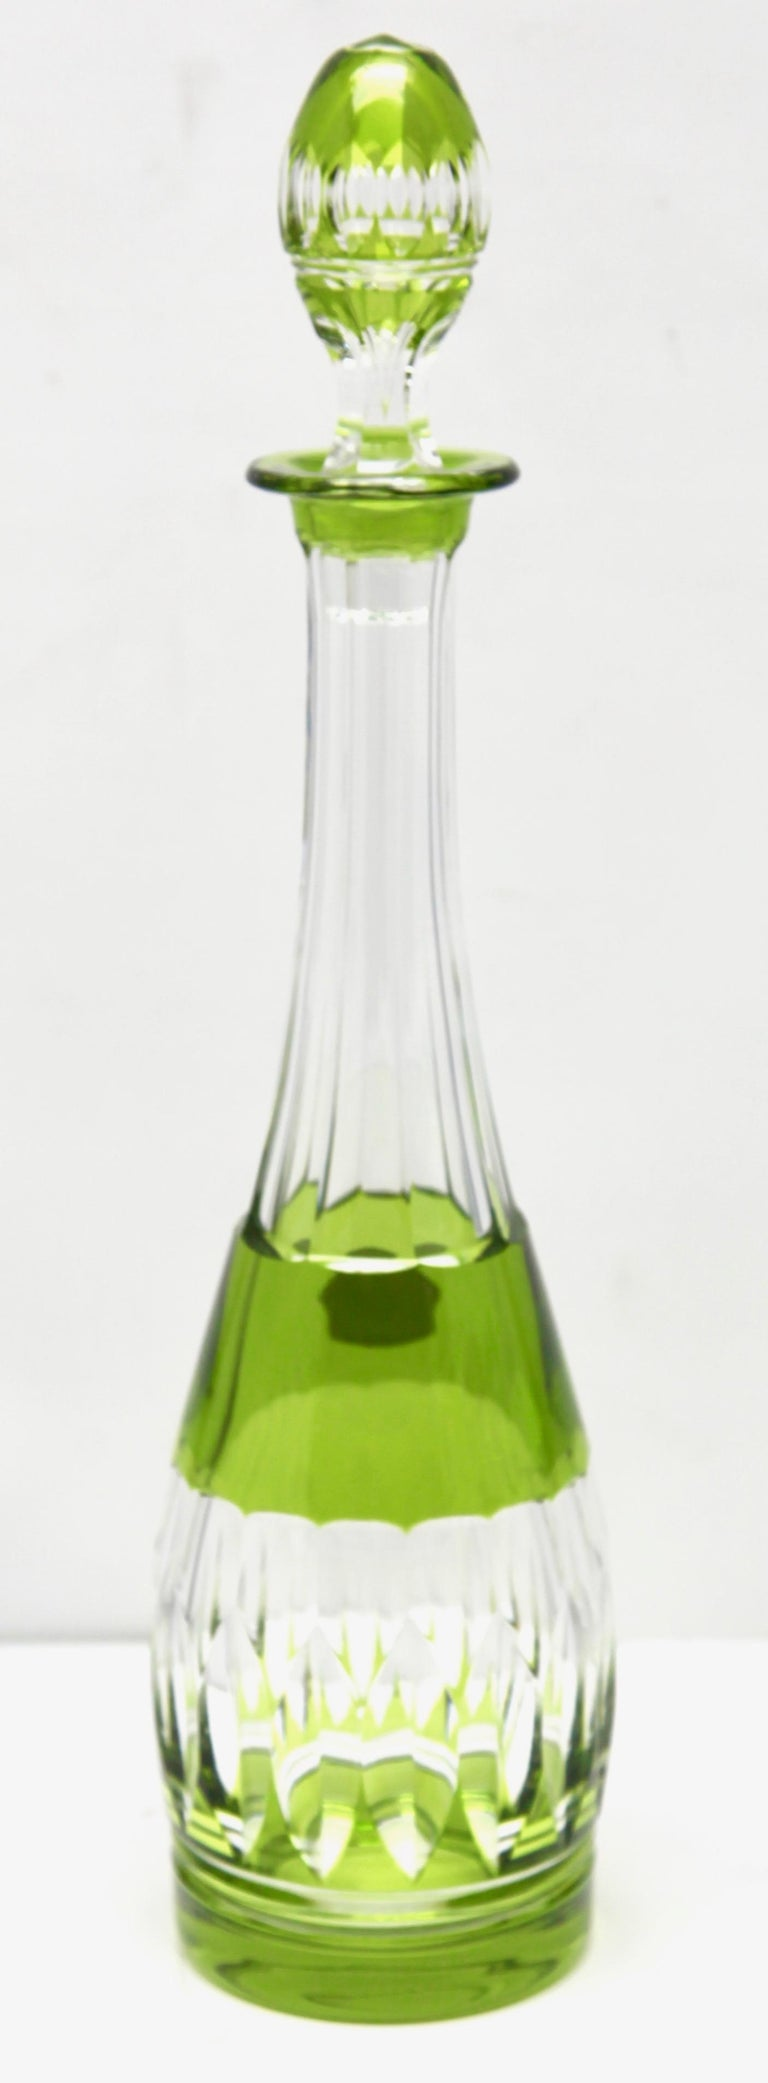 Val Saint Lambert Crystal Decanter, 6 Crystal Wine Goblets Handcut, 1950s For Sale 9